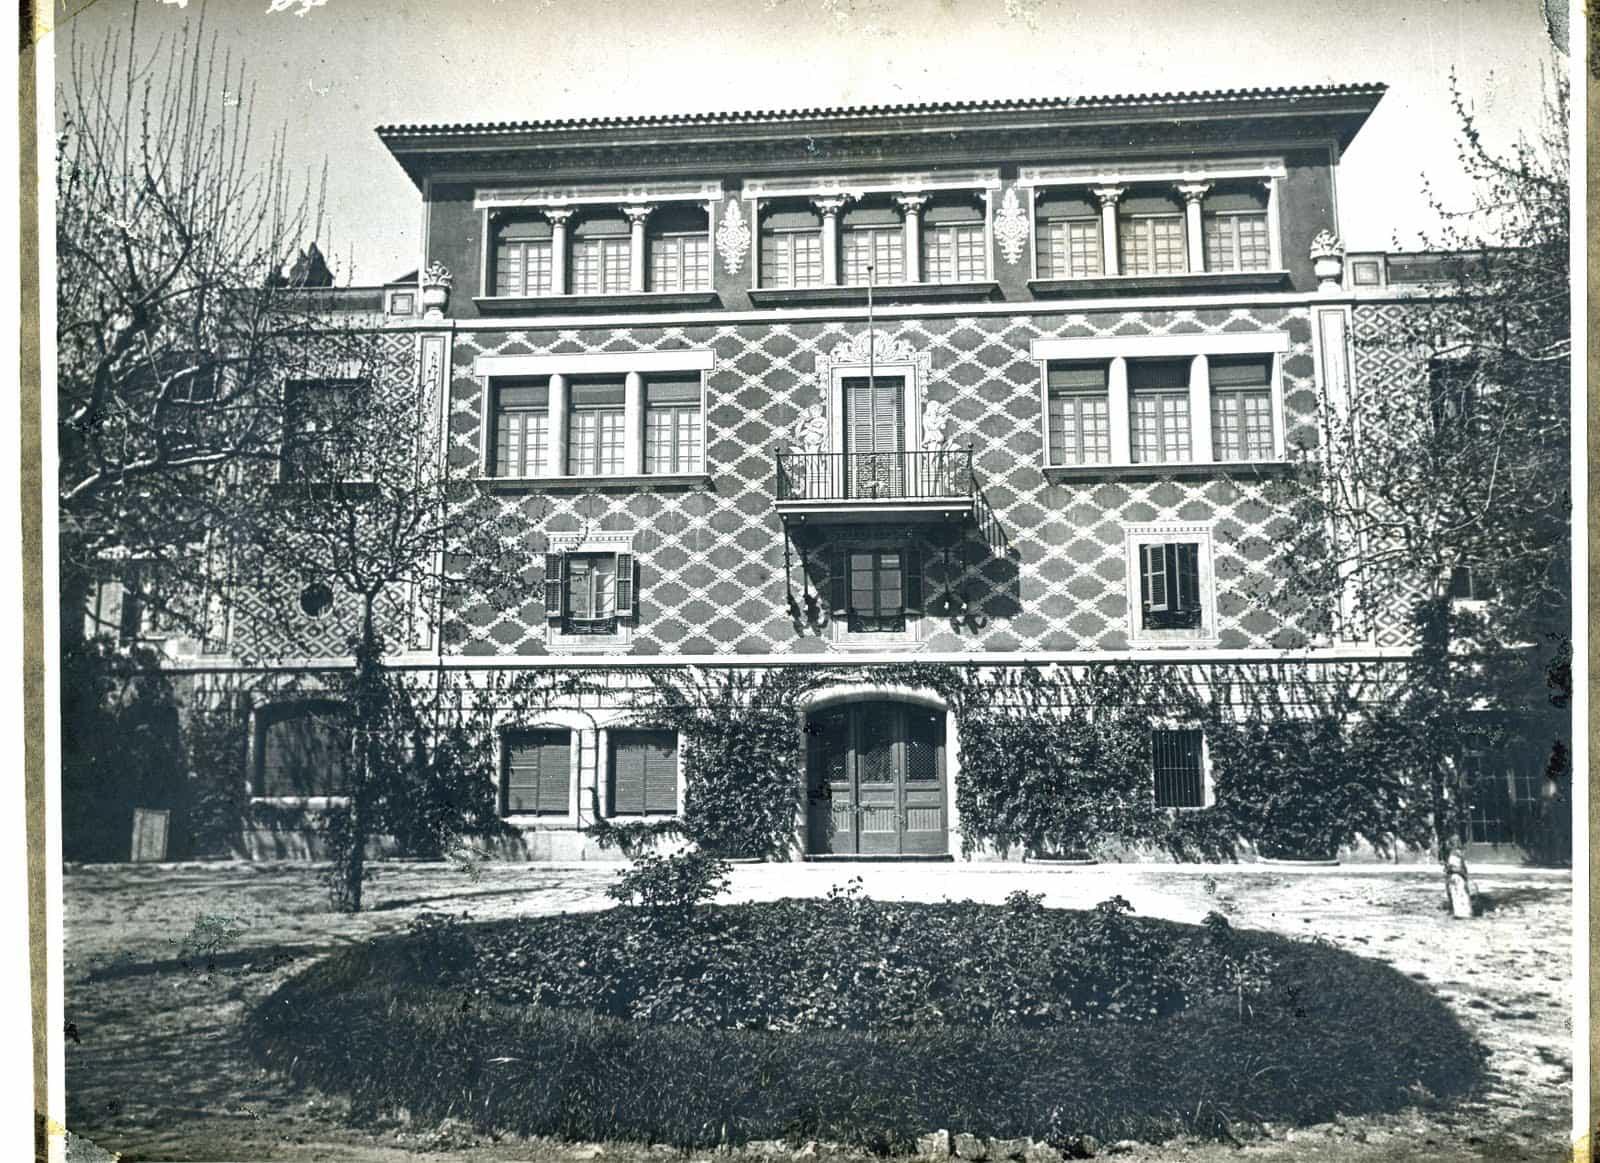 Siglo XVIII - Masie Can MUNTANER, actualmente Colegio Baldiri Reixac (Park Guell)